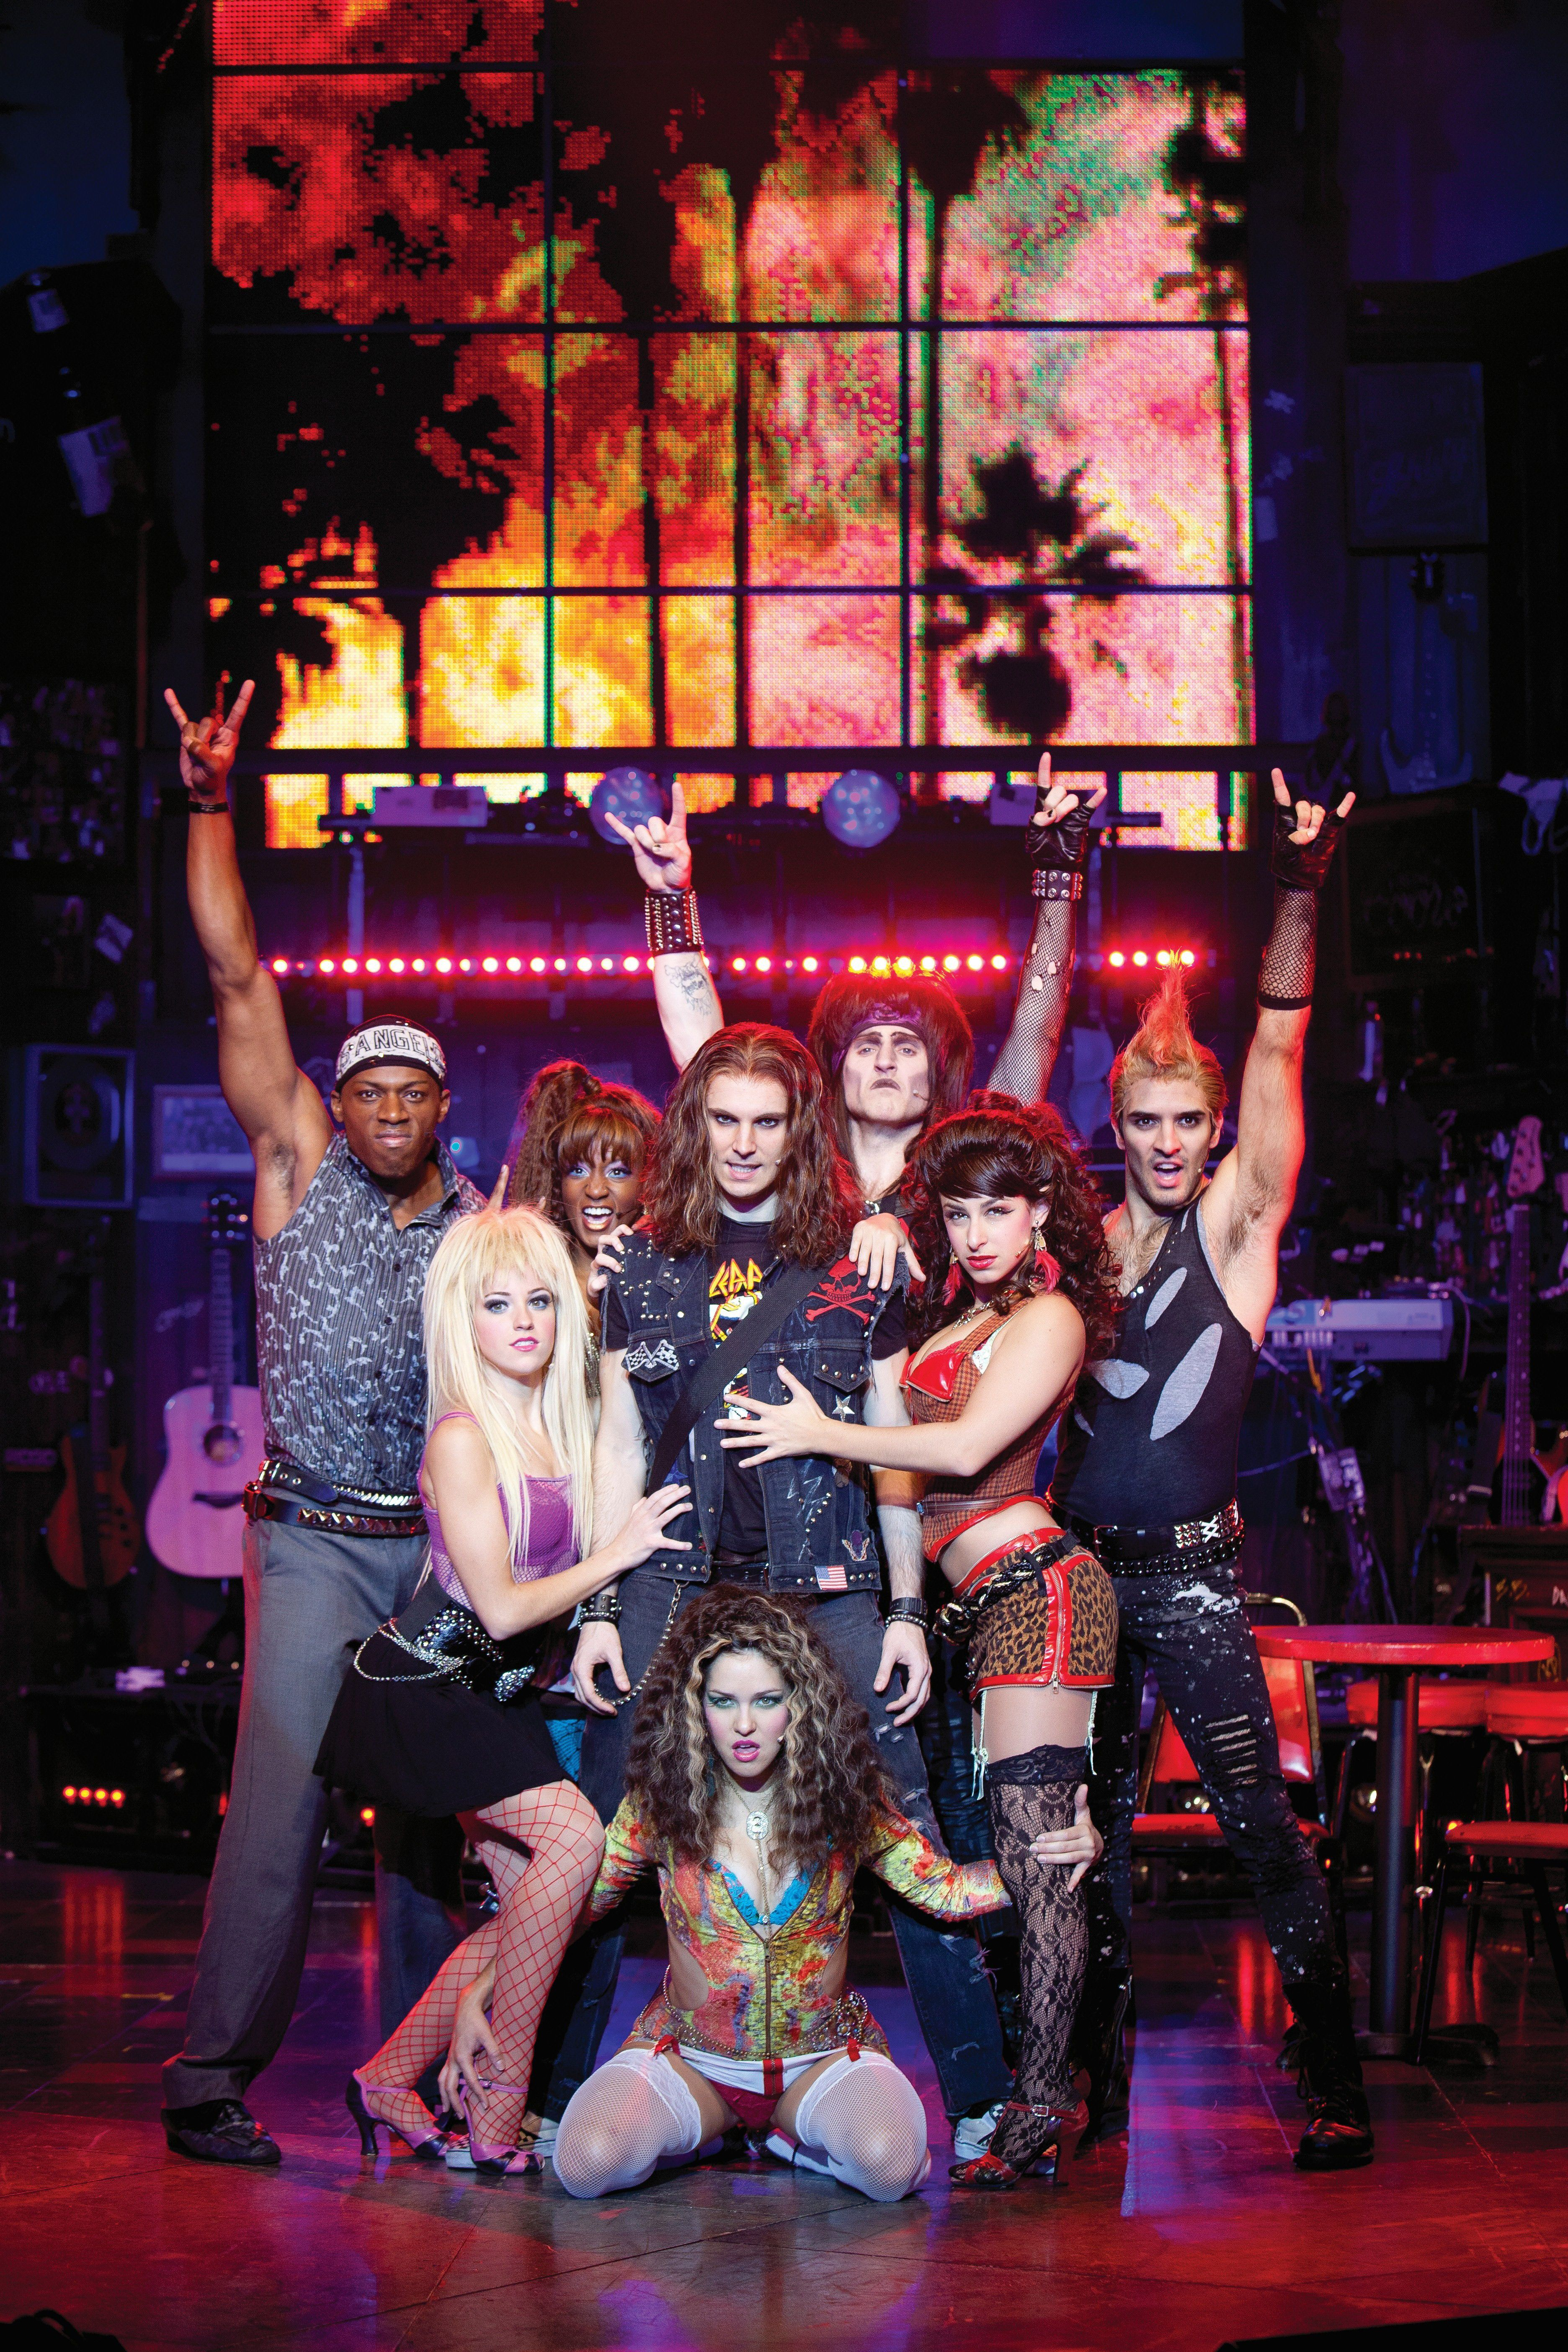 Exklusiv An Bord Der Norwegian Breakaway Konnen Gaste Das Funf Mal Fur Den Begehrten Tony Award Nominierte Broadway Musi Rock Of Ages Rock Of Ages Musical Rock